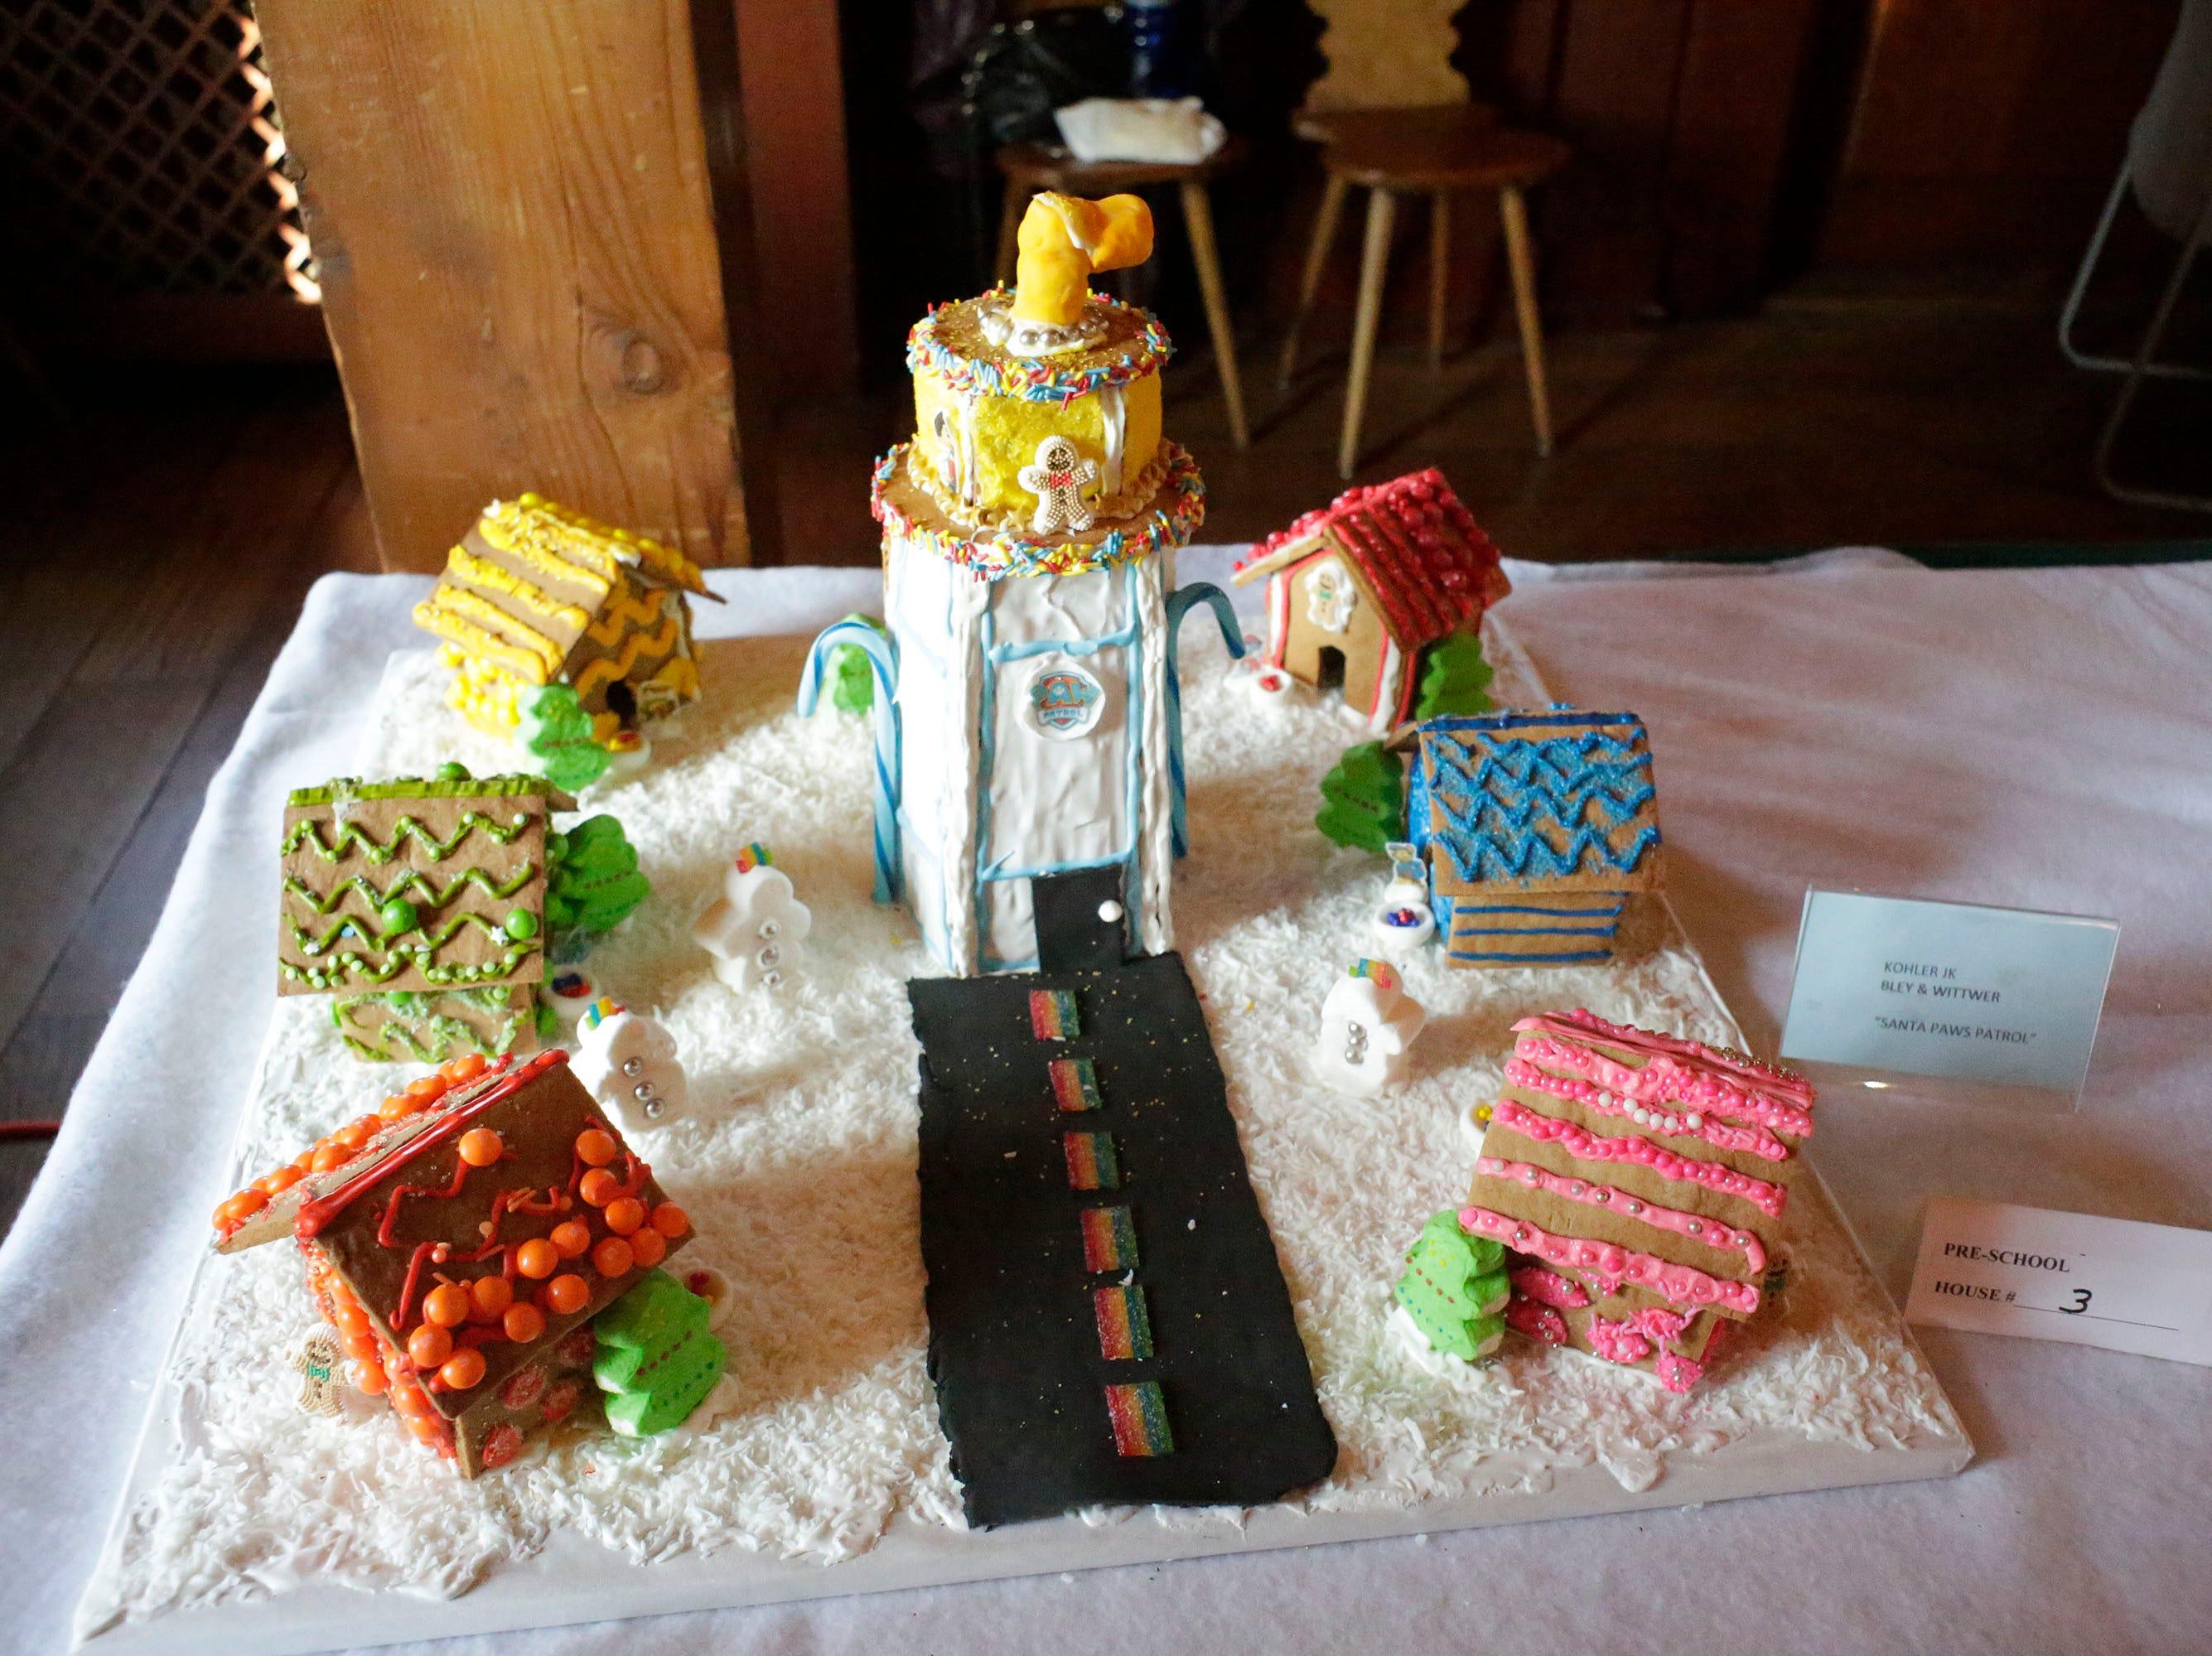 Santa Paws Patro at the annual Waelderhaus Gingerbread Festival, Saturday, December 8, 2018, in Kohler, Wis.